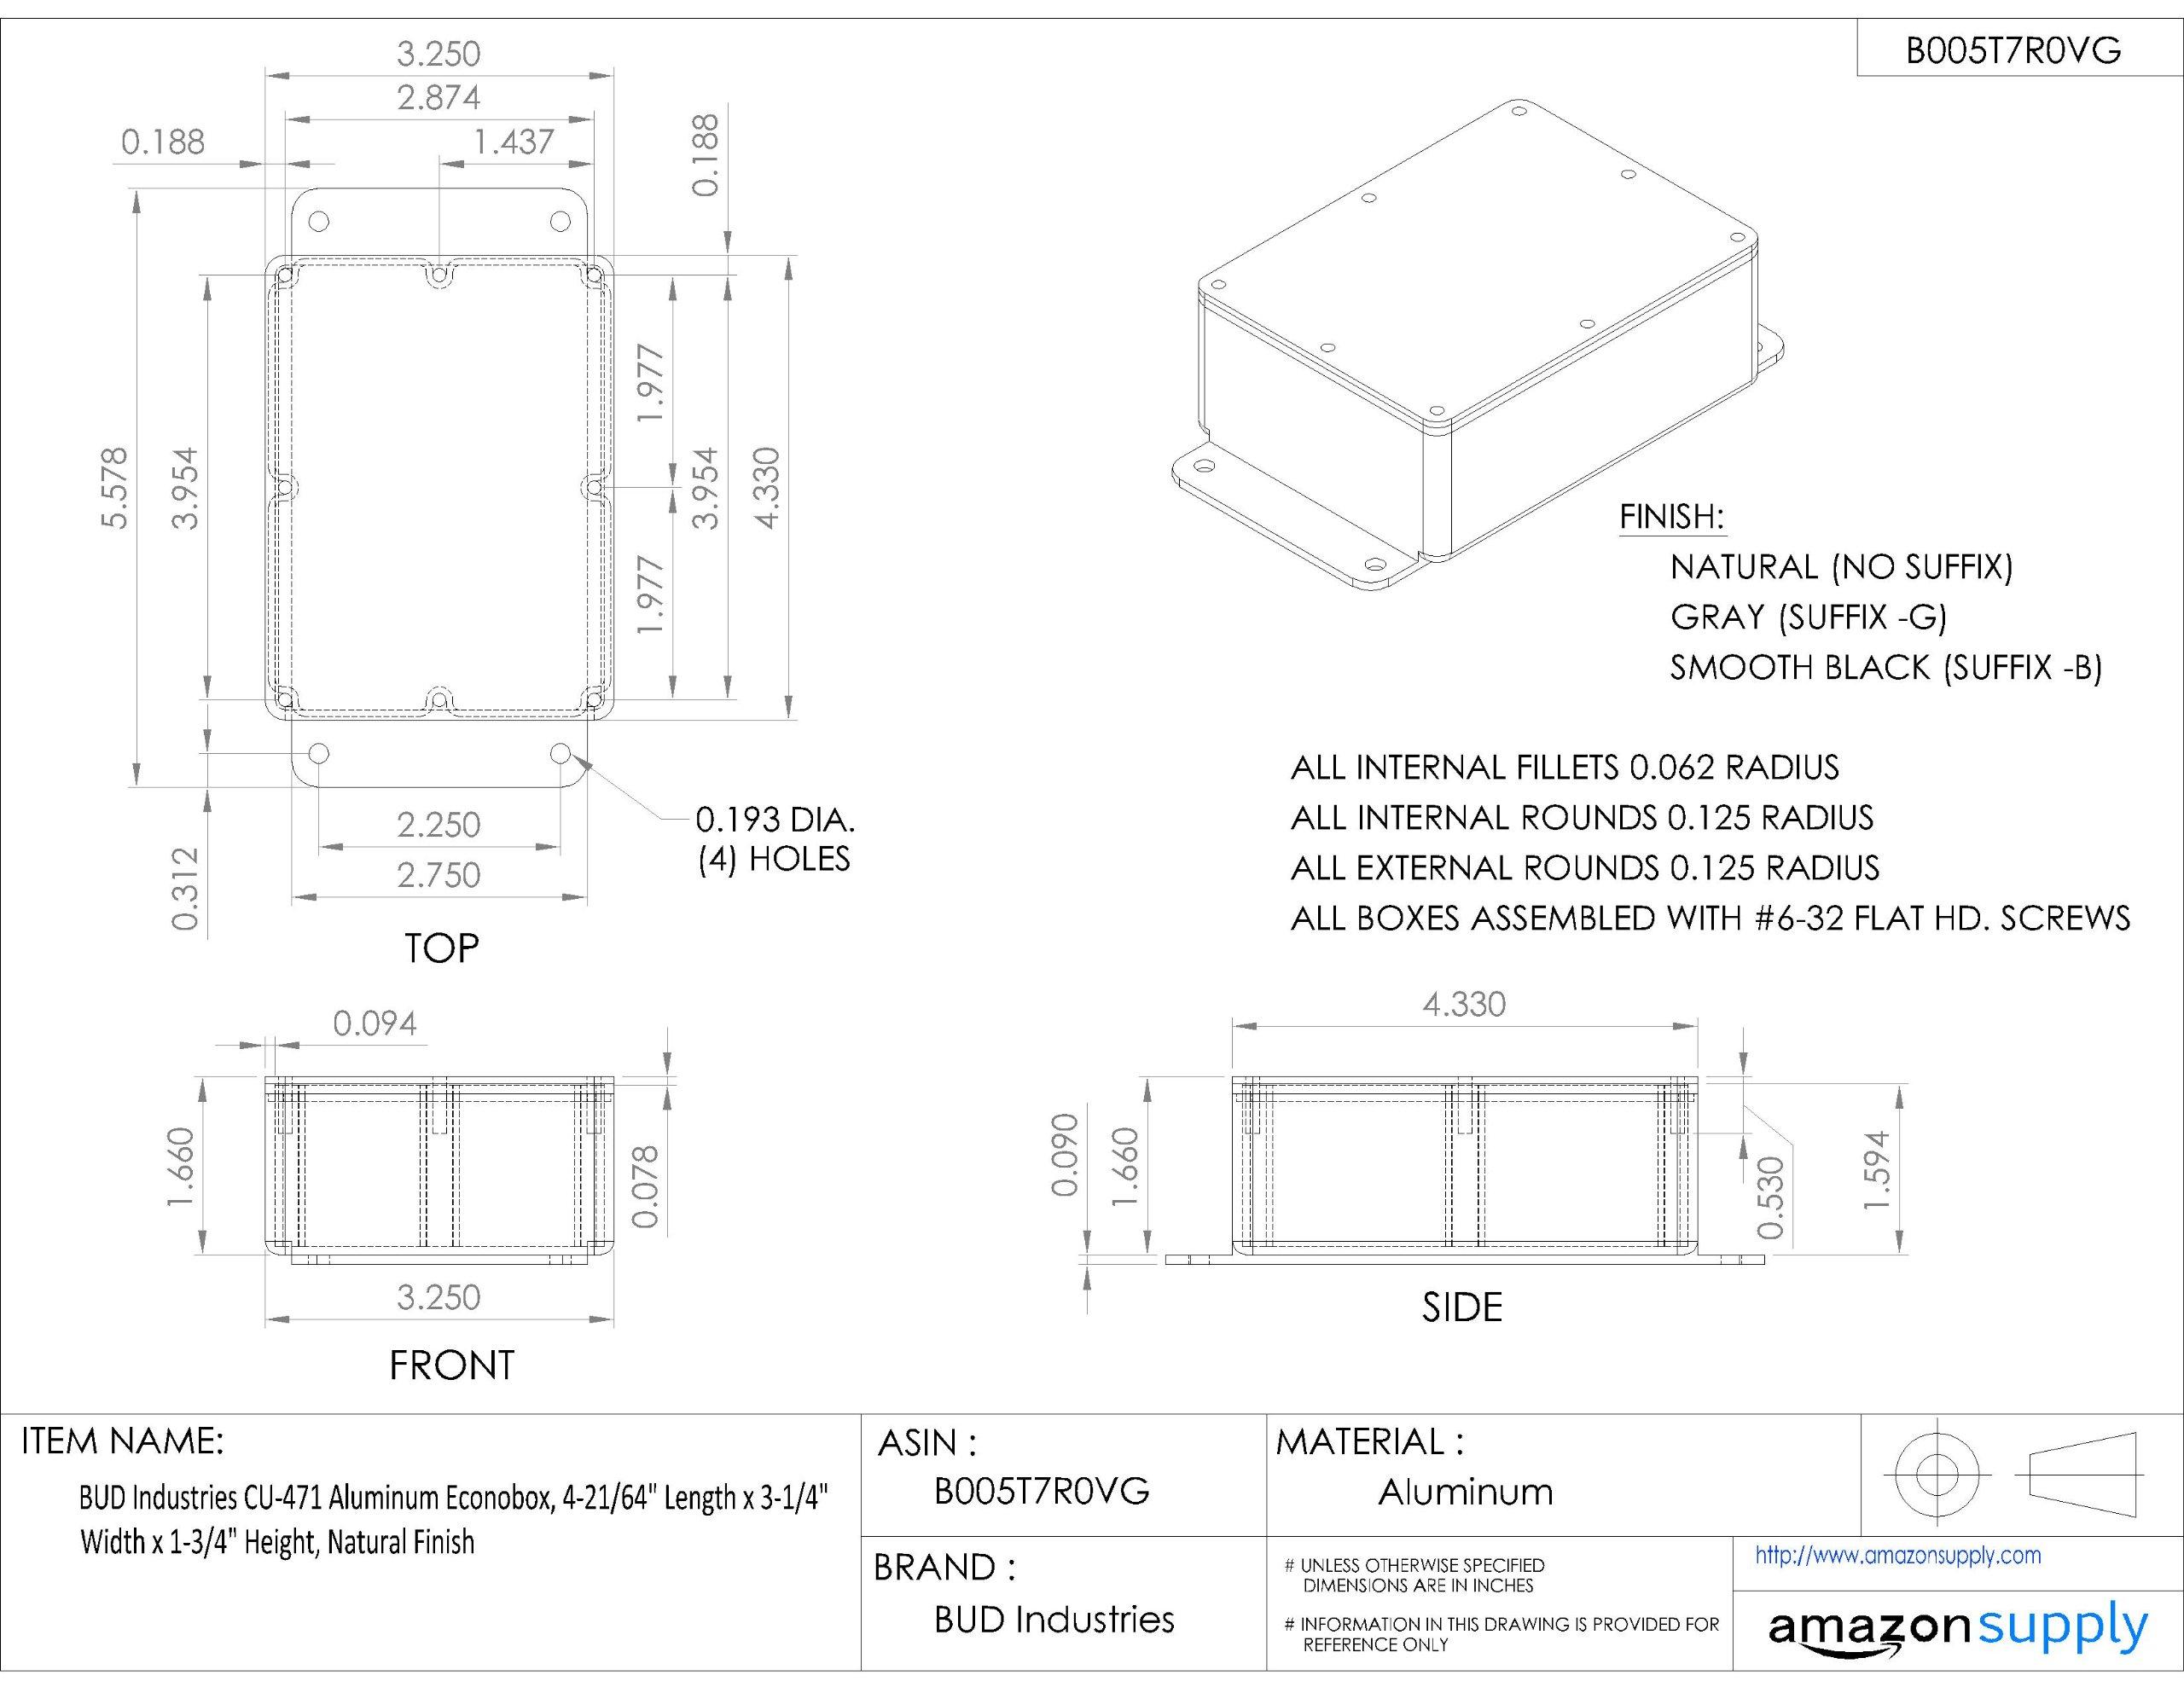 BUD Industries CU-471 Aluminum Econobox, 4-21/64'' Length x 3-1/4'' Width x 1-3/4'' Height, Natural Finish